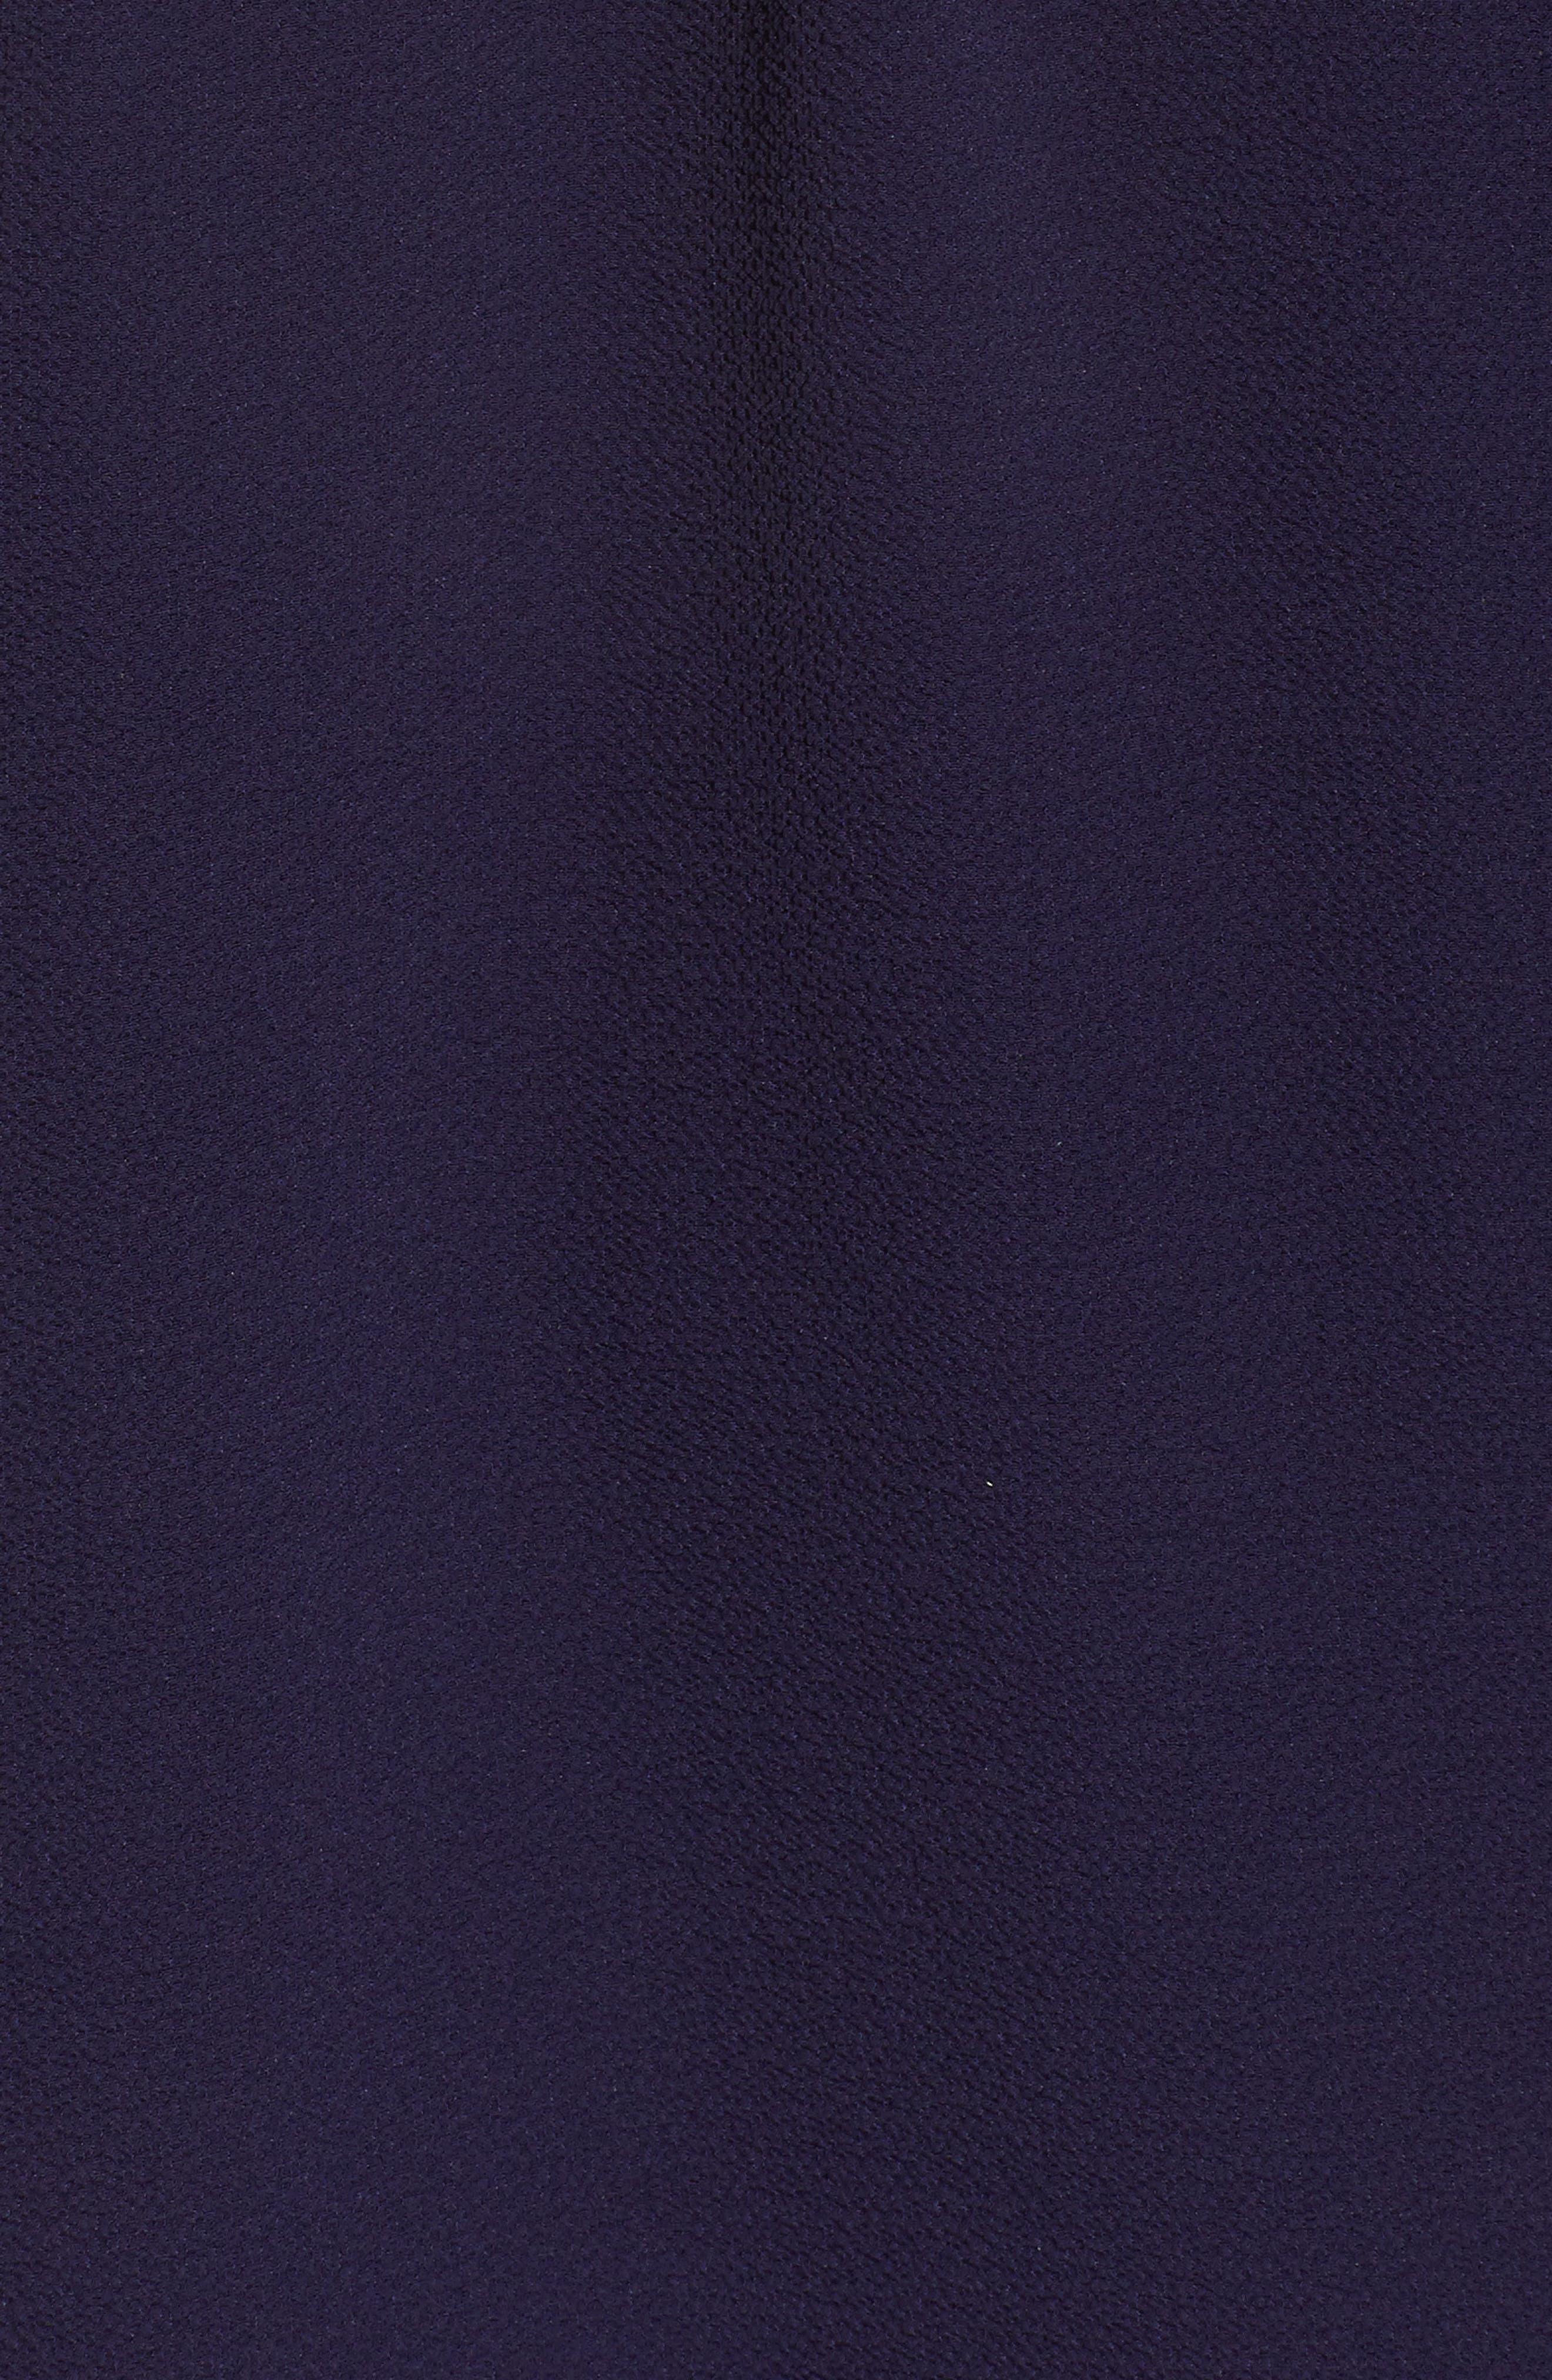 Off the Shoulder Embroidered Fringe Top,                             Alternate thumbnail 6, color,                             Evening Navy